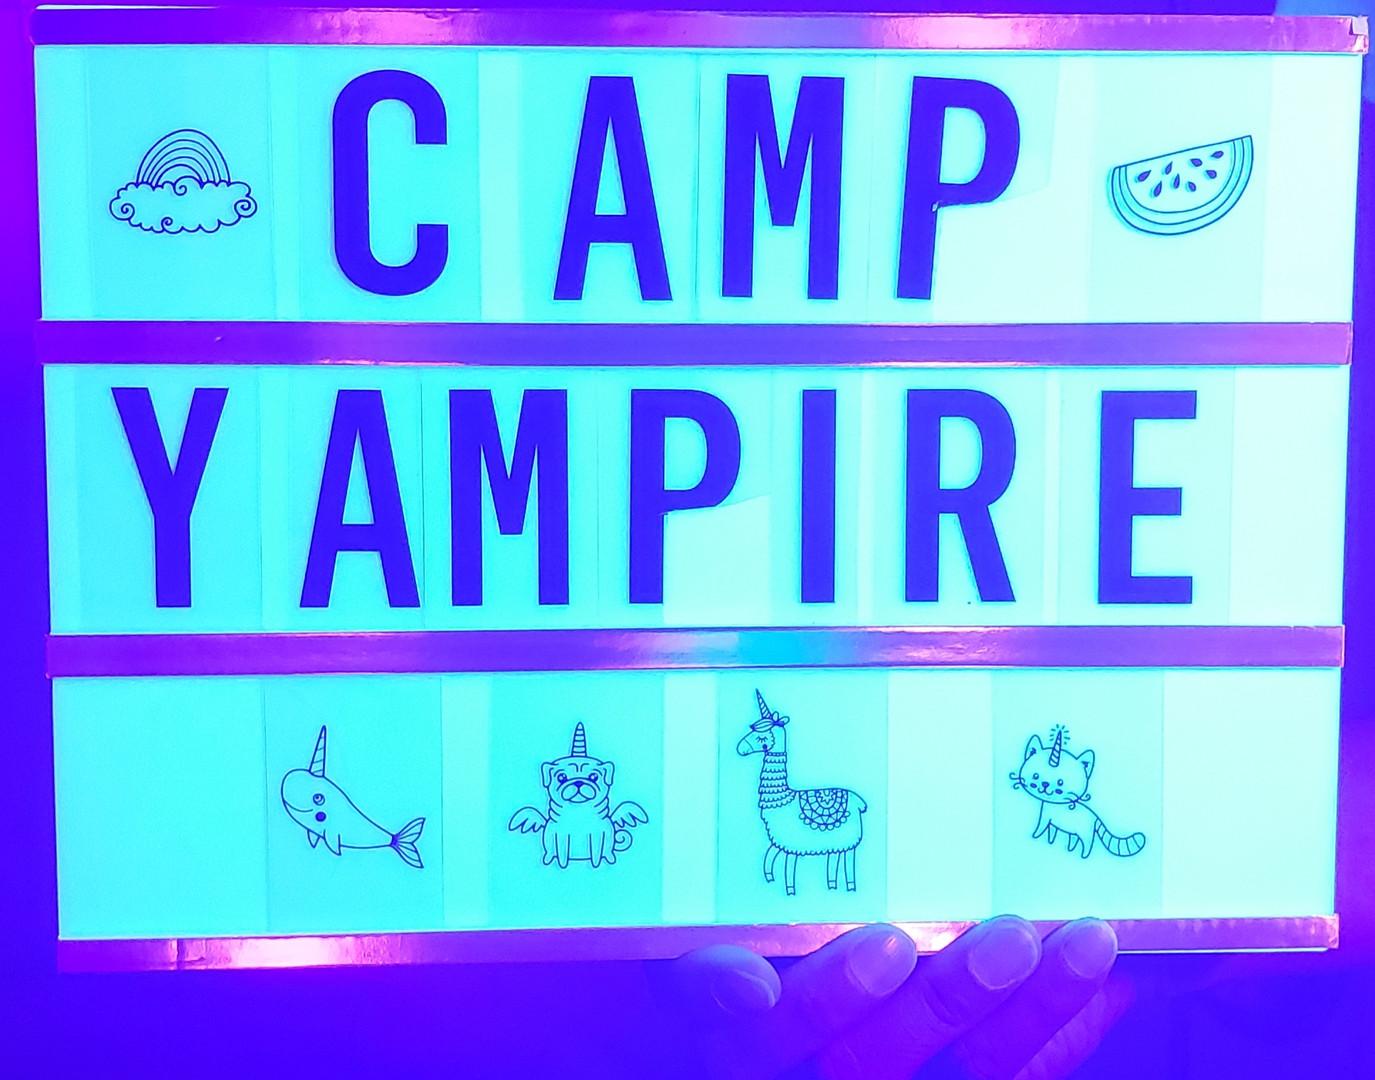 Camp Yampire 2